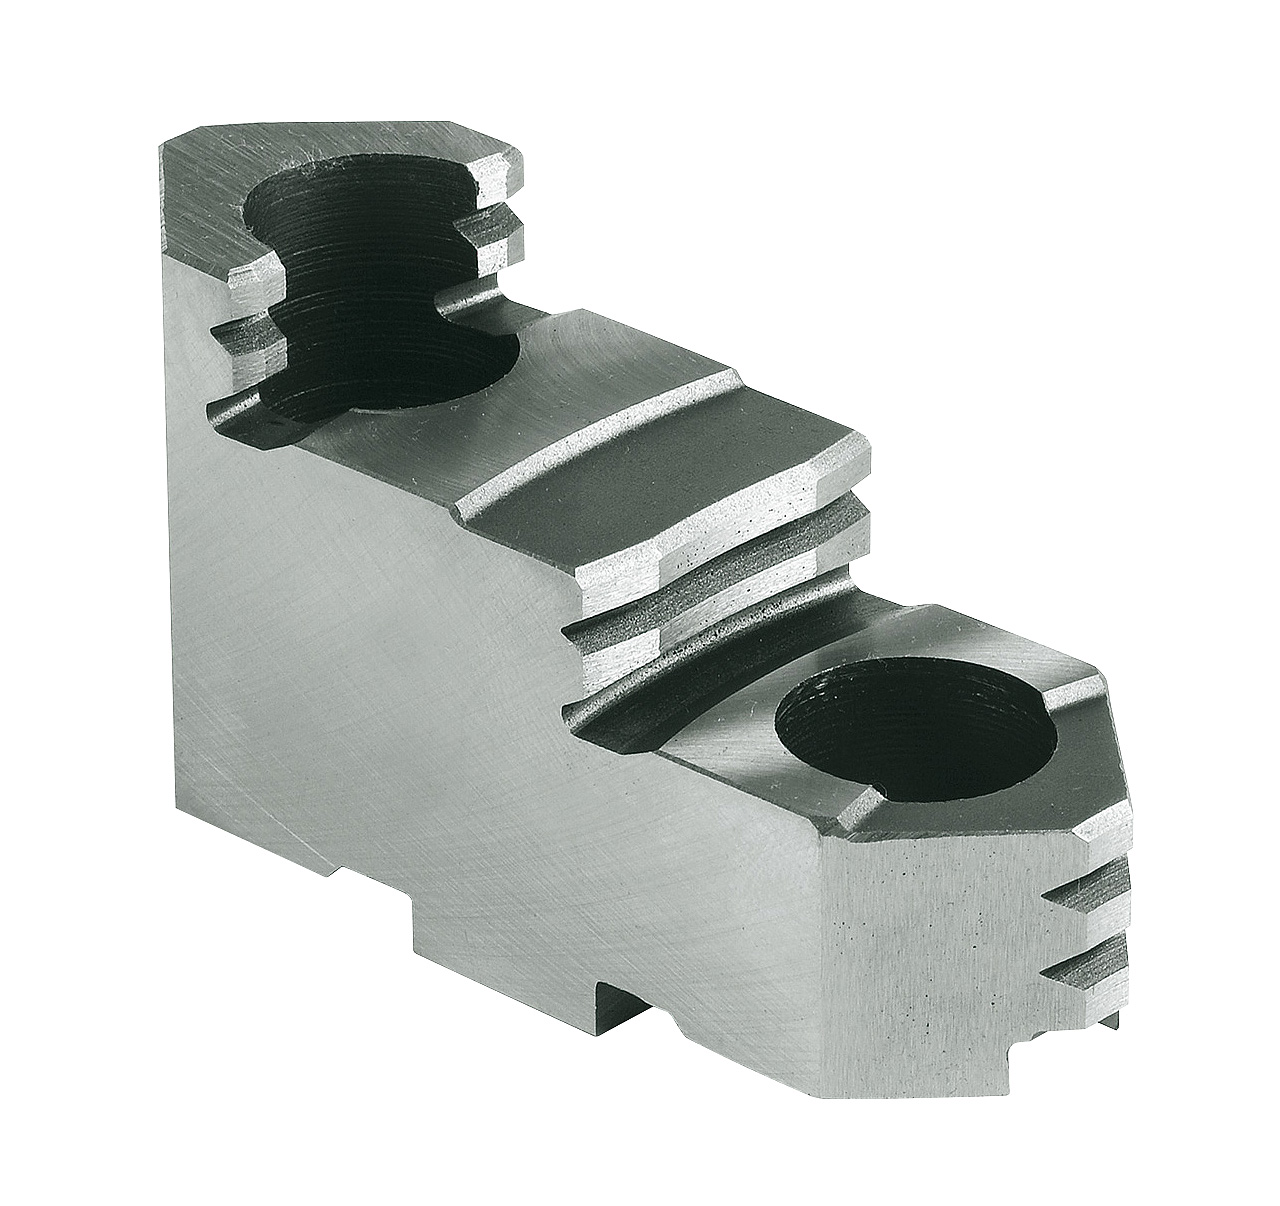 Szczęki górne twarde - komplet DTJ-DK11-315 BERNARDO